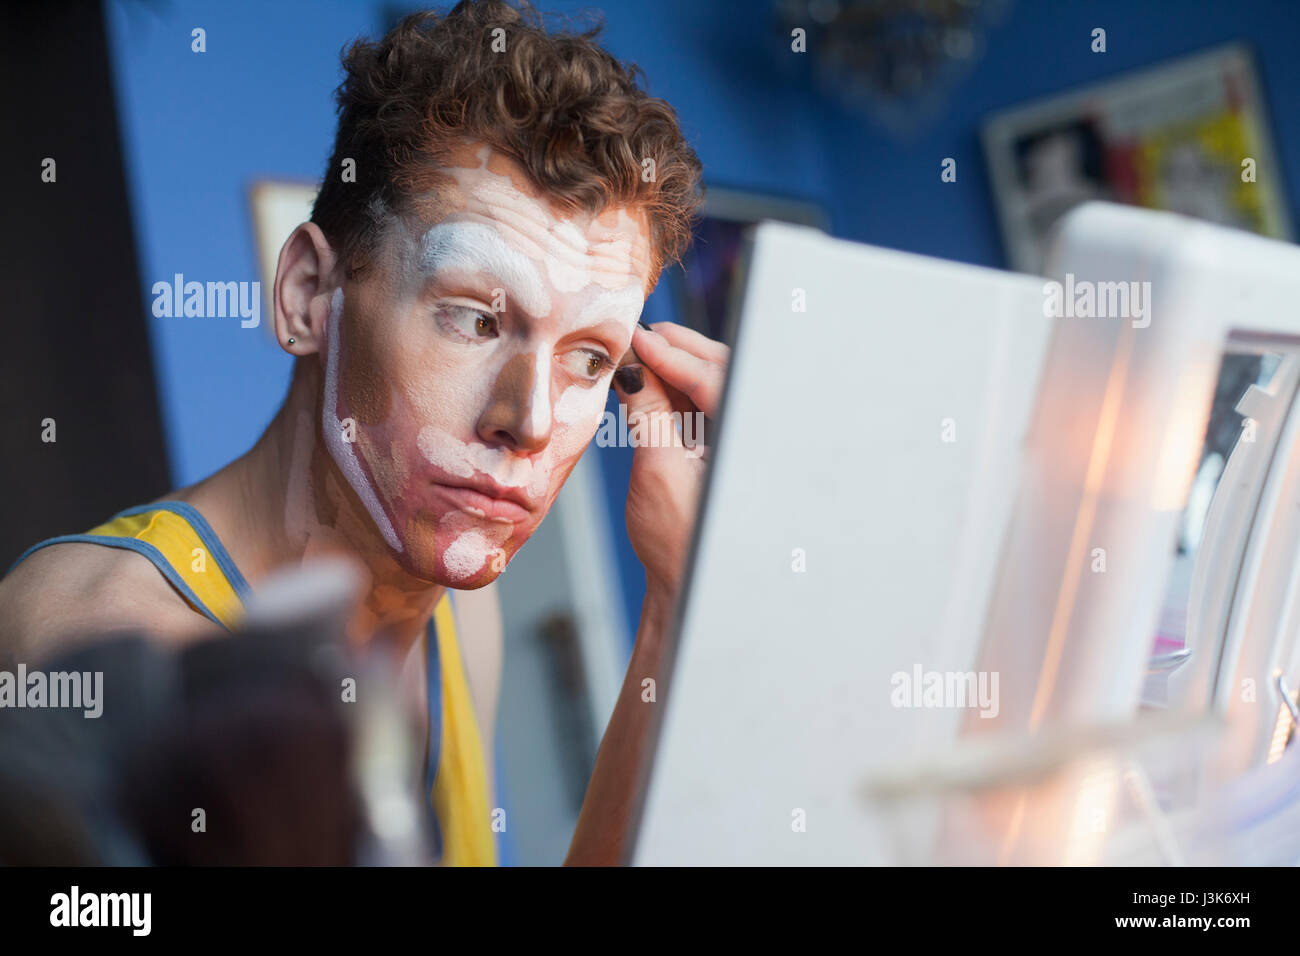 Young man applying drag makeup - Stock Image